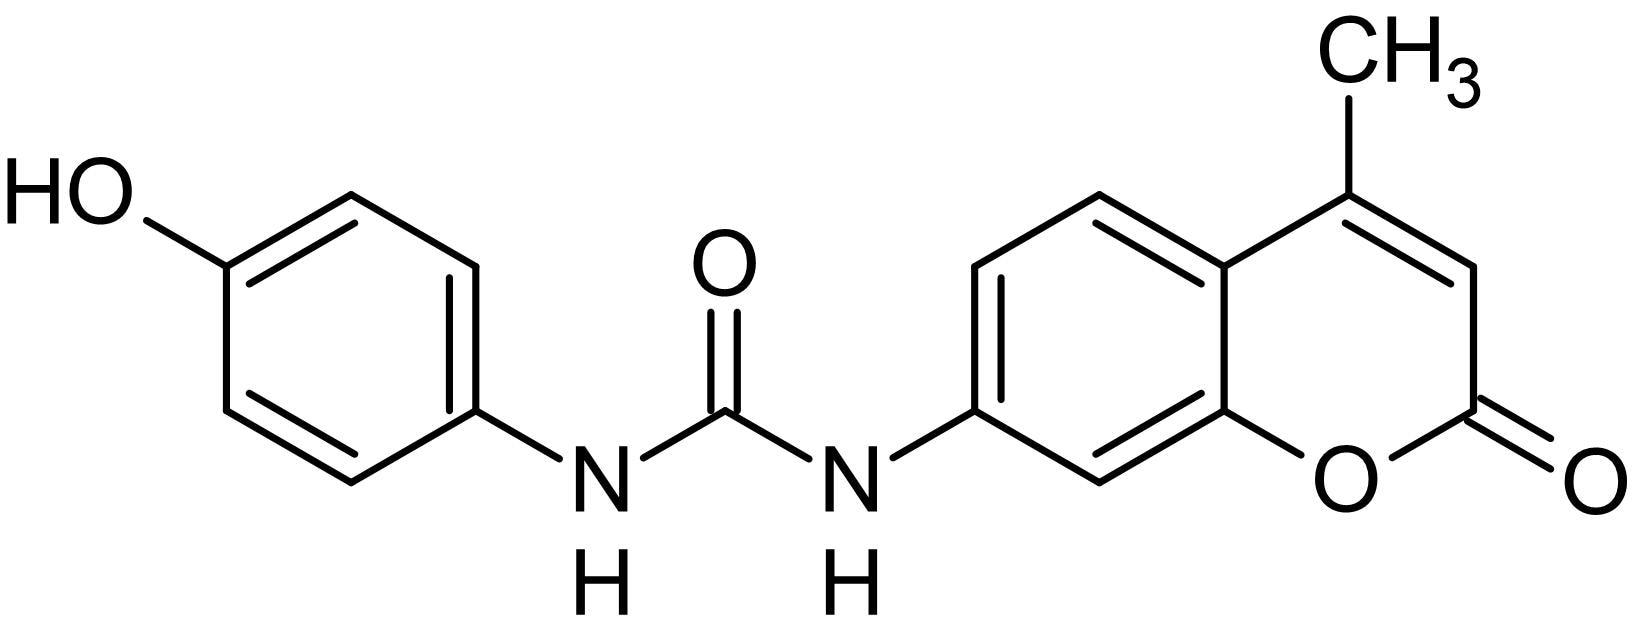 Chemical Structure - PAP-AMC, Tyrosinase substrate, Fluorogenic tyrosinase substrate (ab145211)